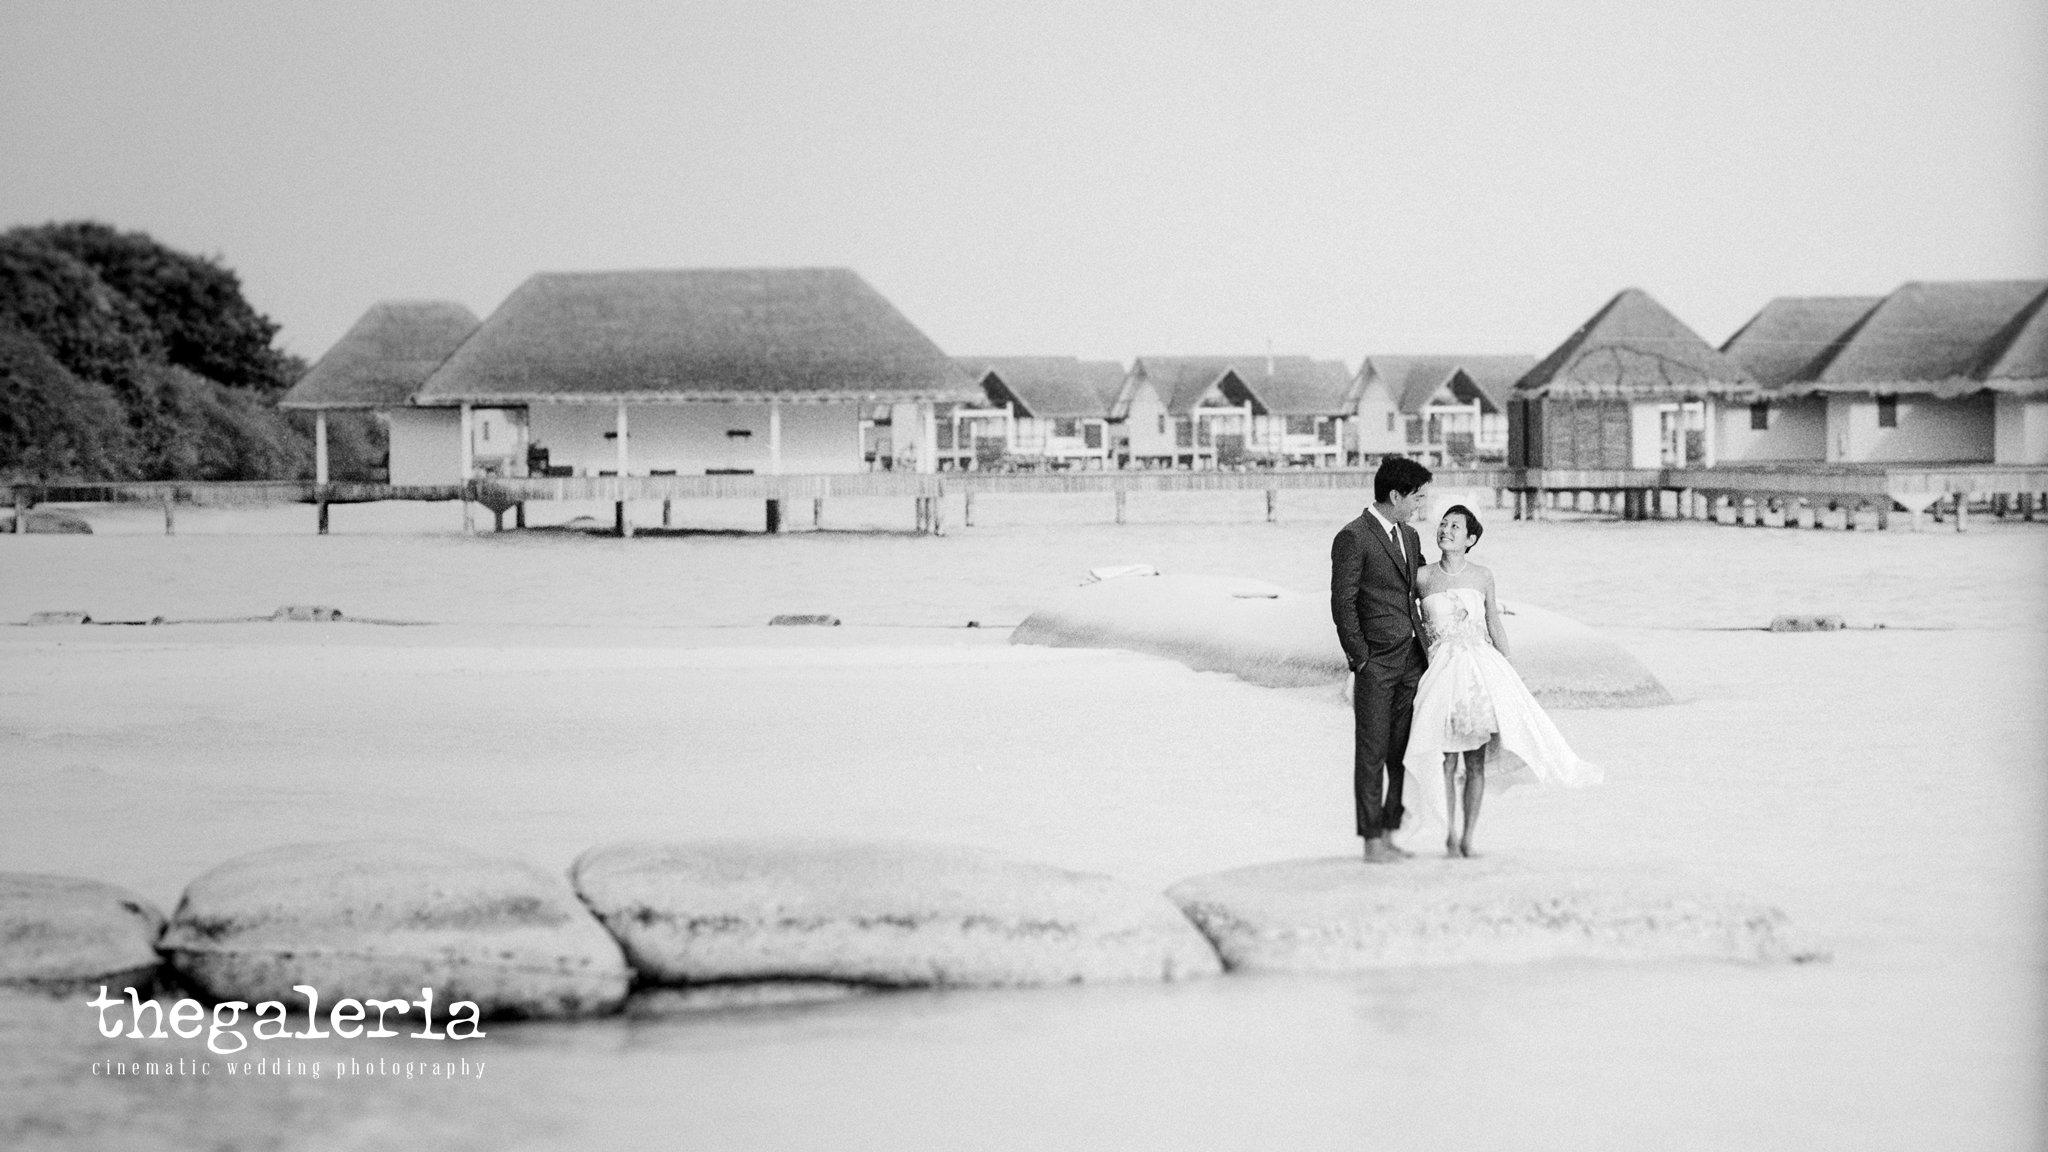 Maldives Pre-Wedding & Destination Weddings by Film Wedding Photographer Brian Ho from thegaleria. Film: Ilford Delta 100